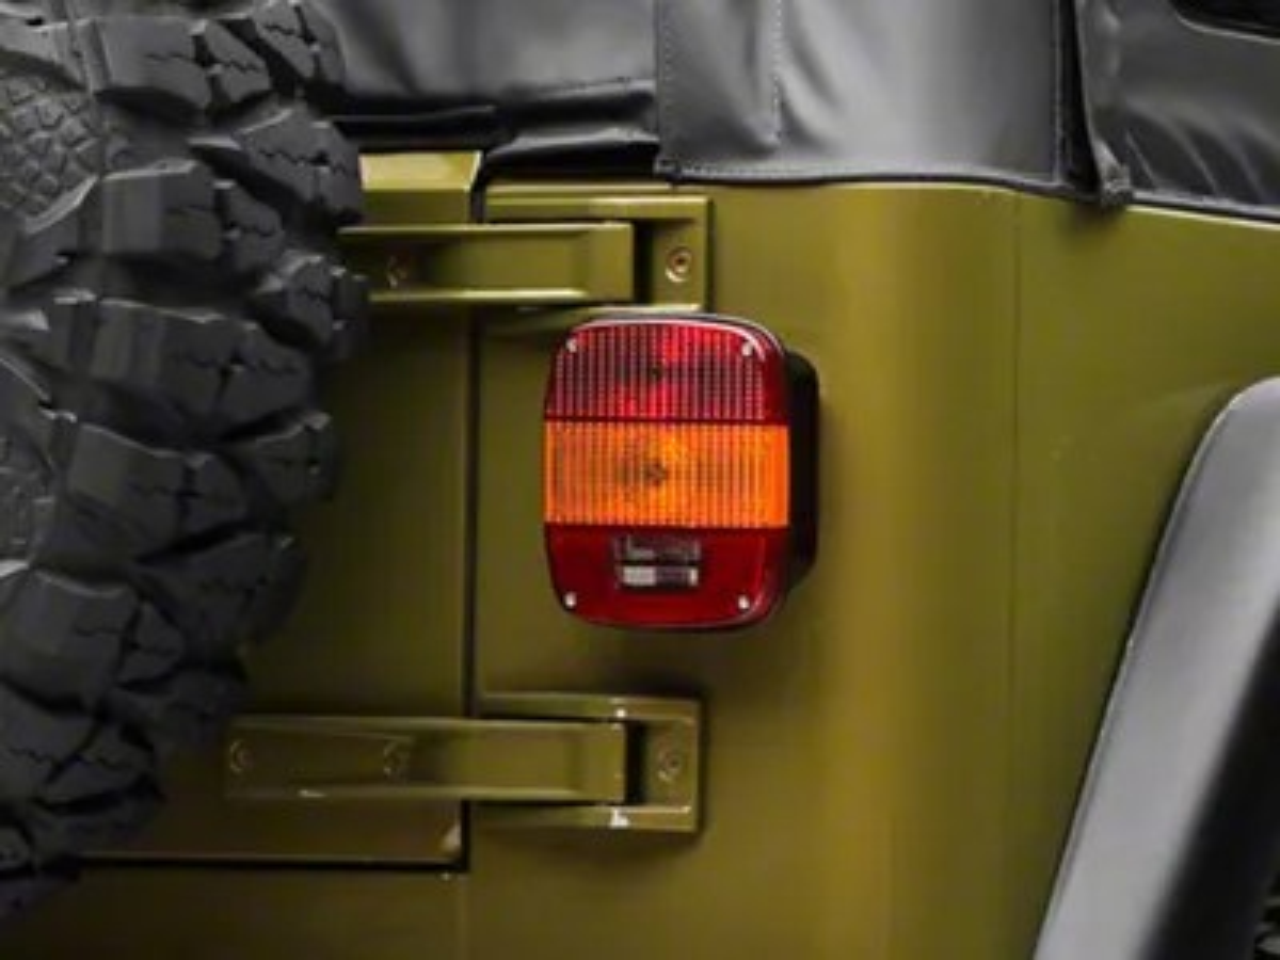 Jeep Wrangler Export Tail Light (9706 Jeep Wrangler TJ)